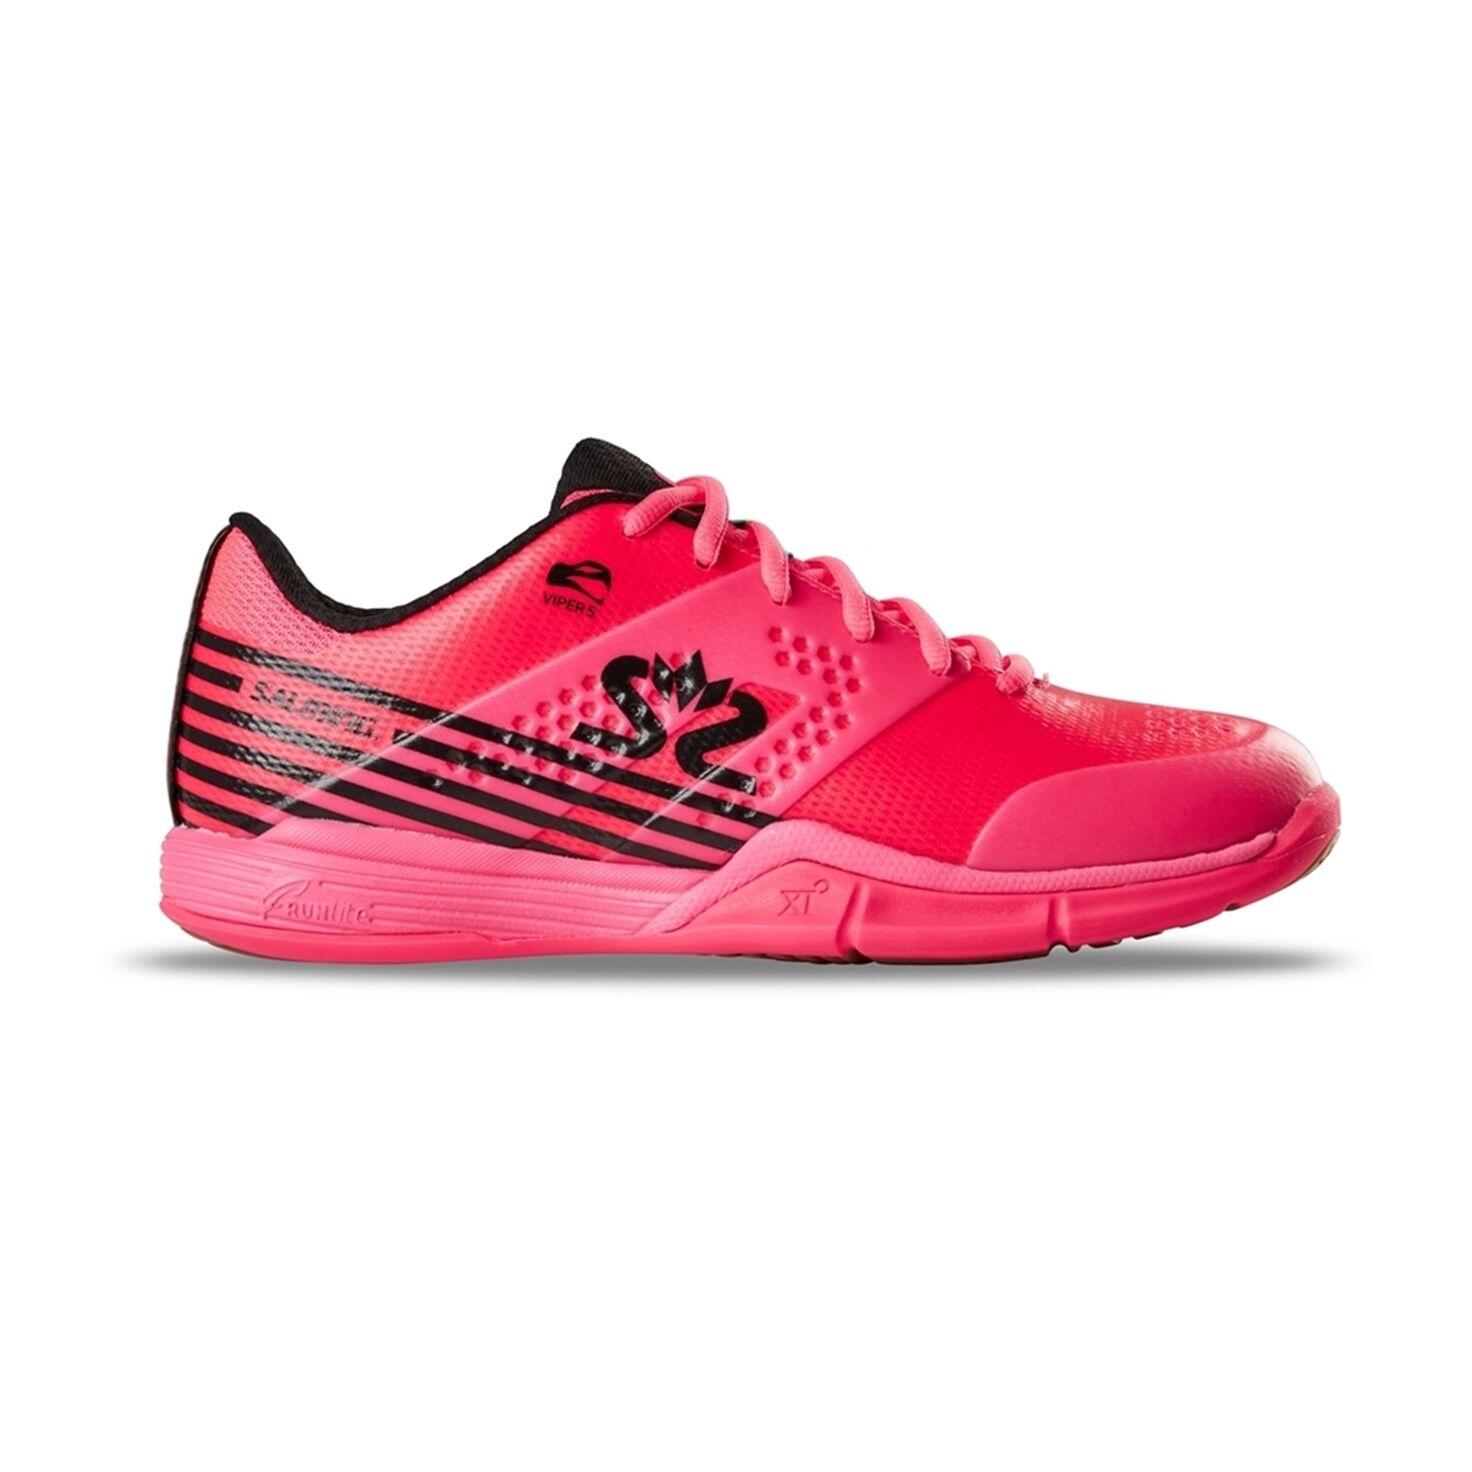 Salming Viper 5 Women Pink/Black 38 2/3